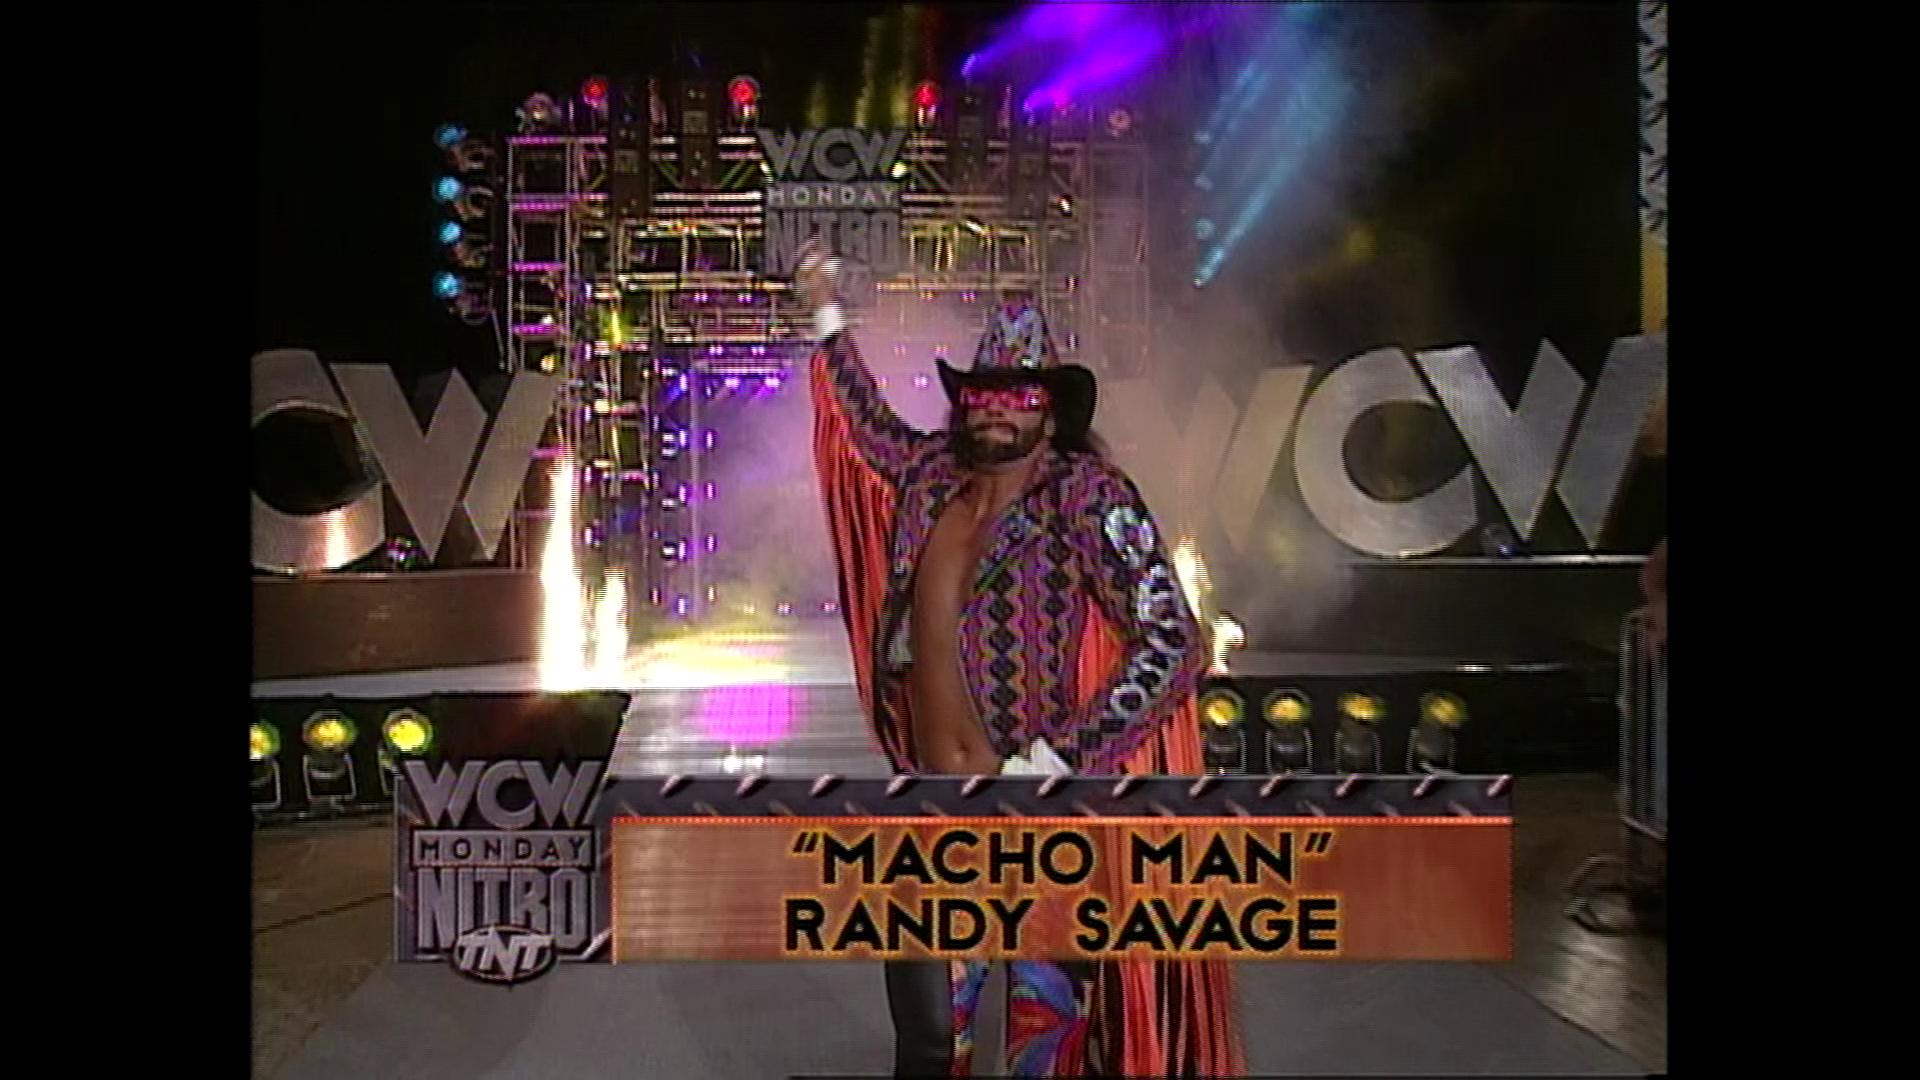 Wwe Macho Man The Randy Savage Story Fetch Publicity